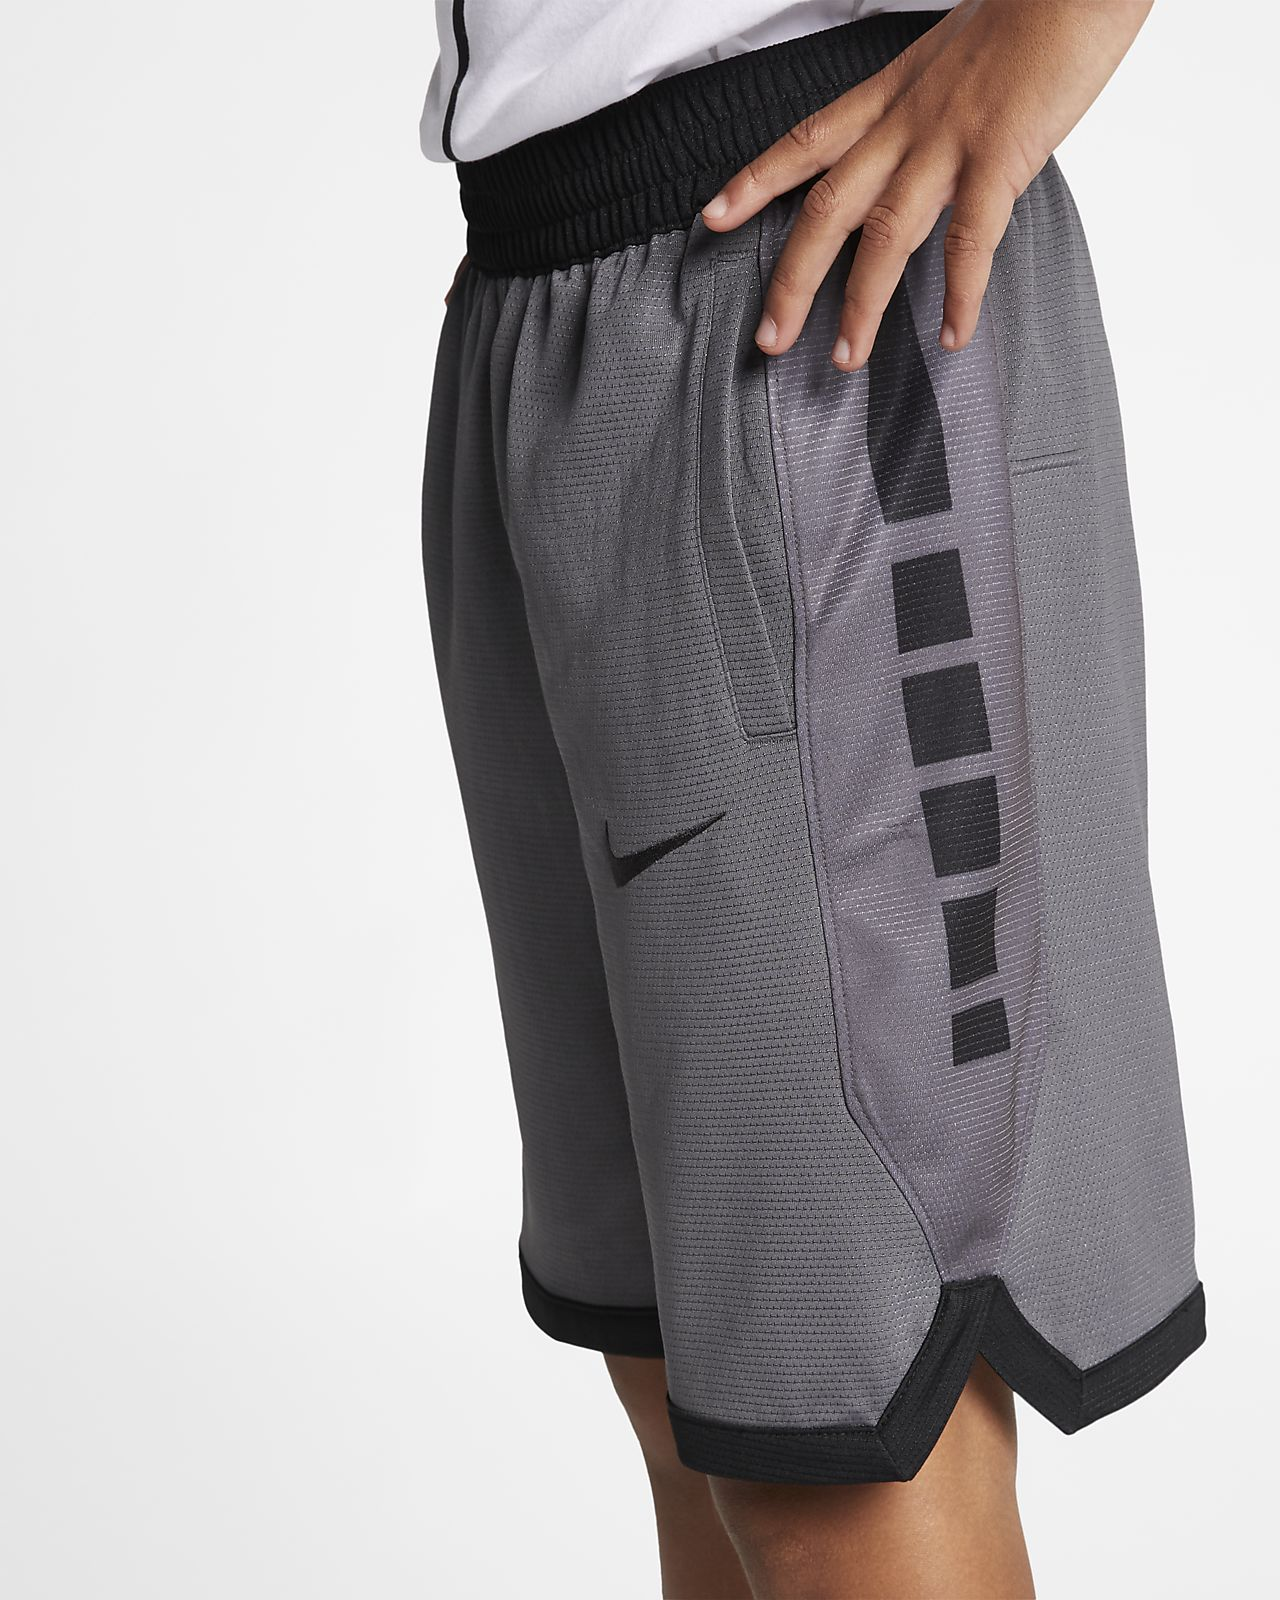 711ee838071290 Nike Dri-FIT Big Kids  (Boys ) Basketball Shorts. Nike.com